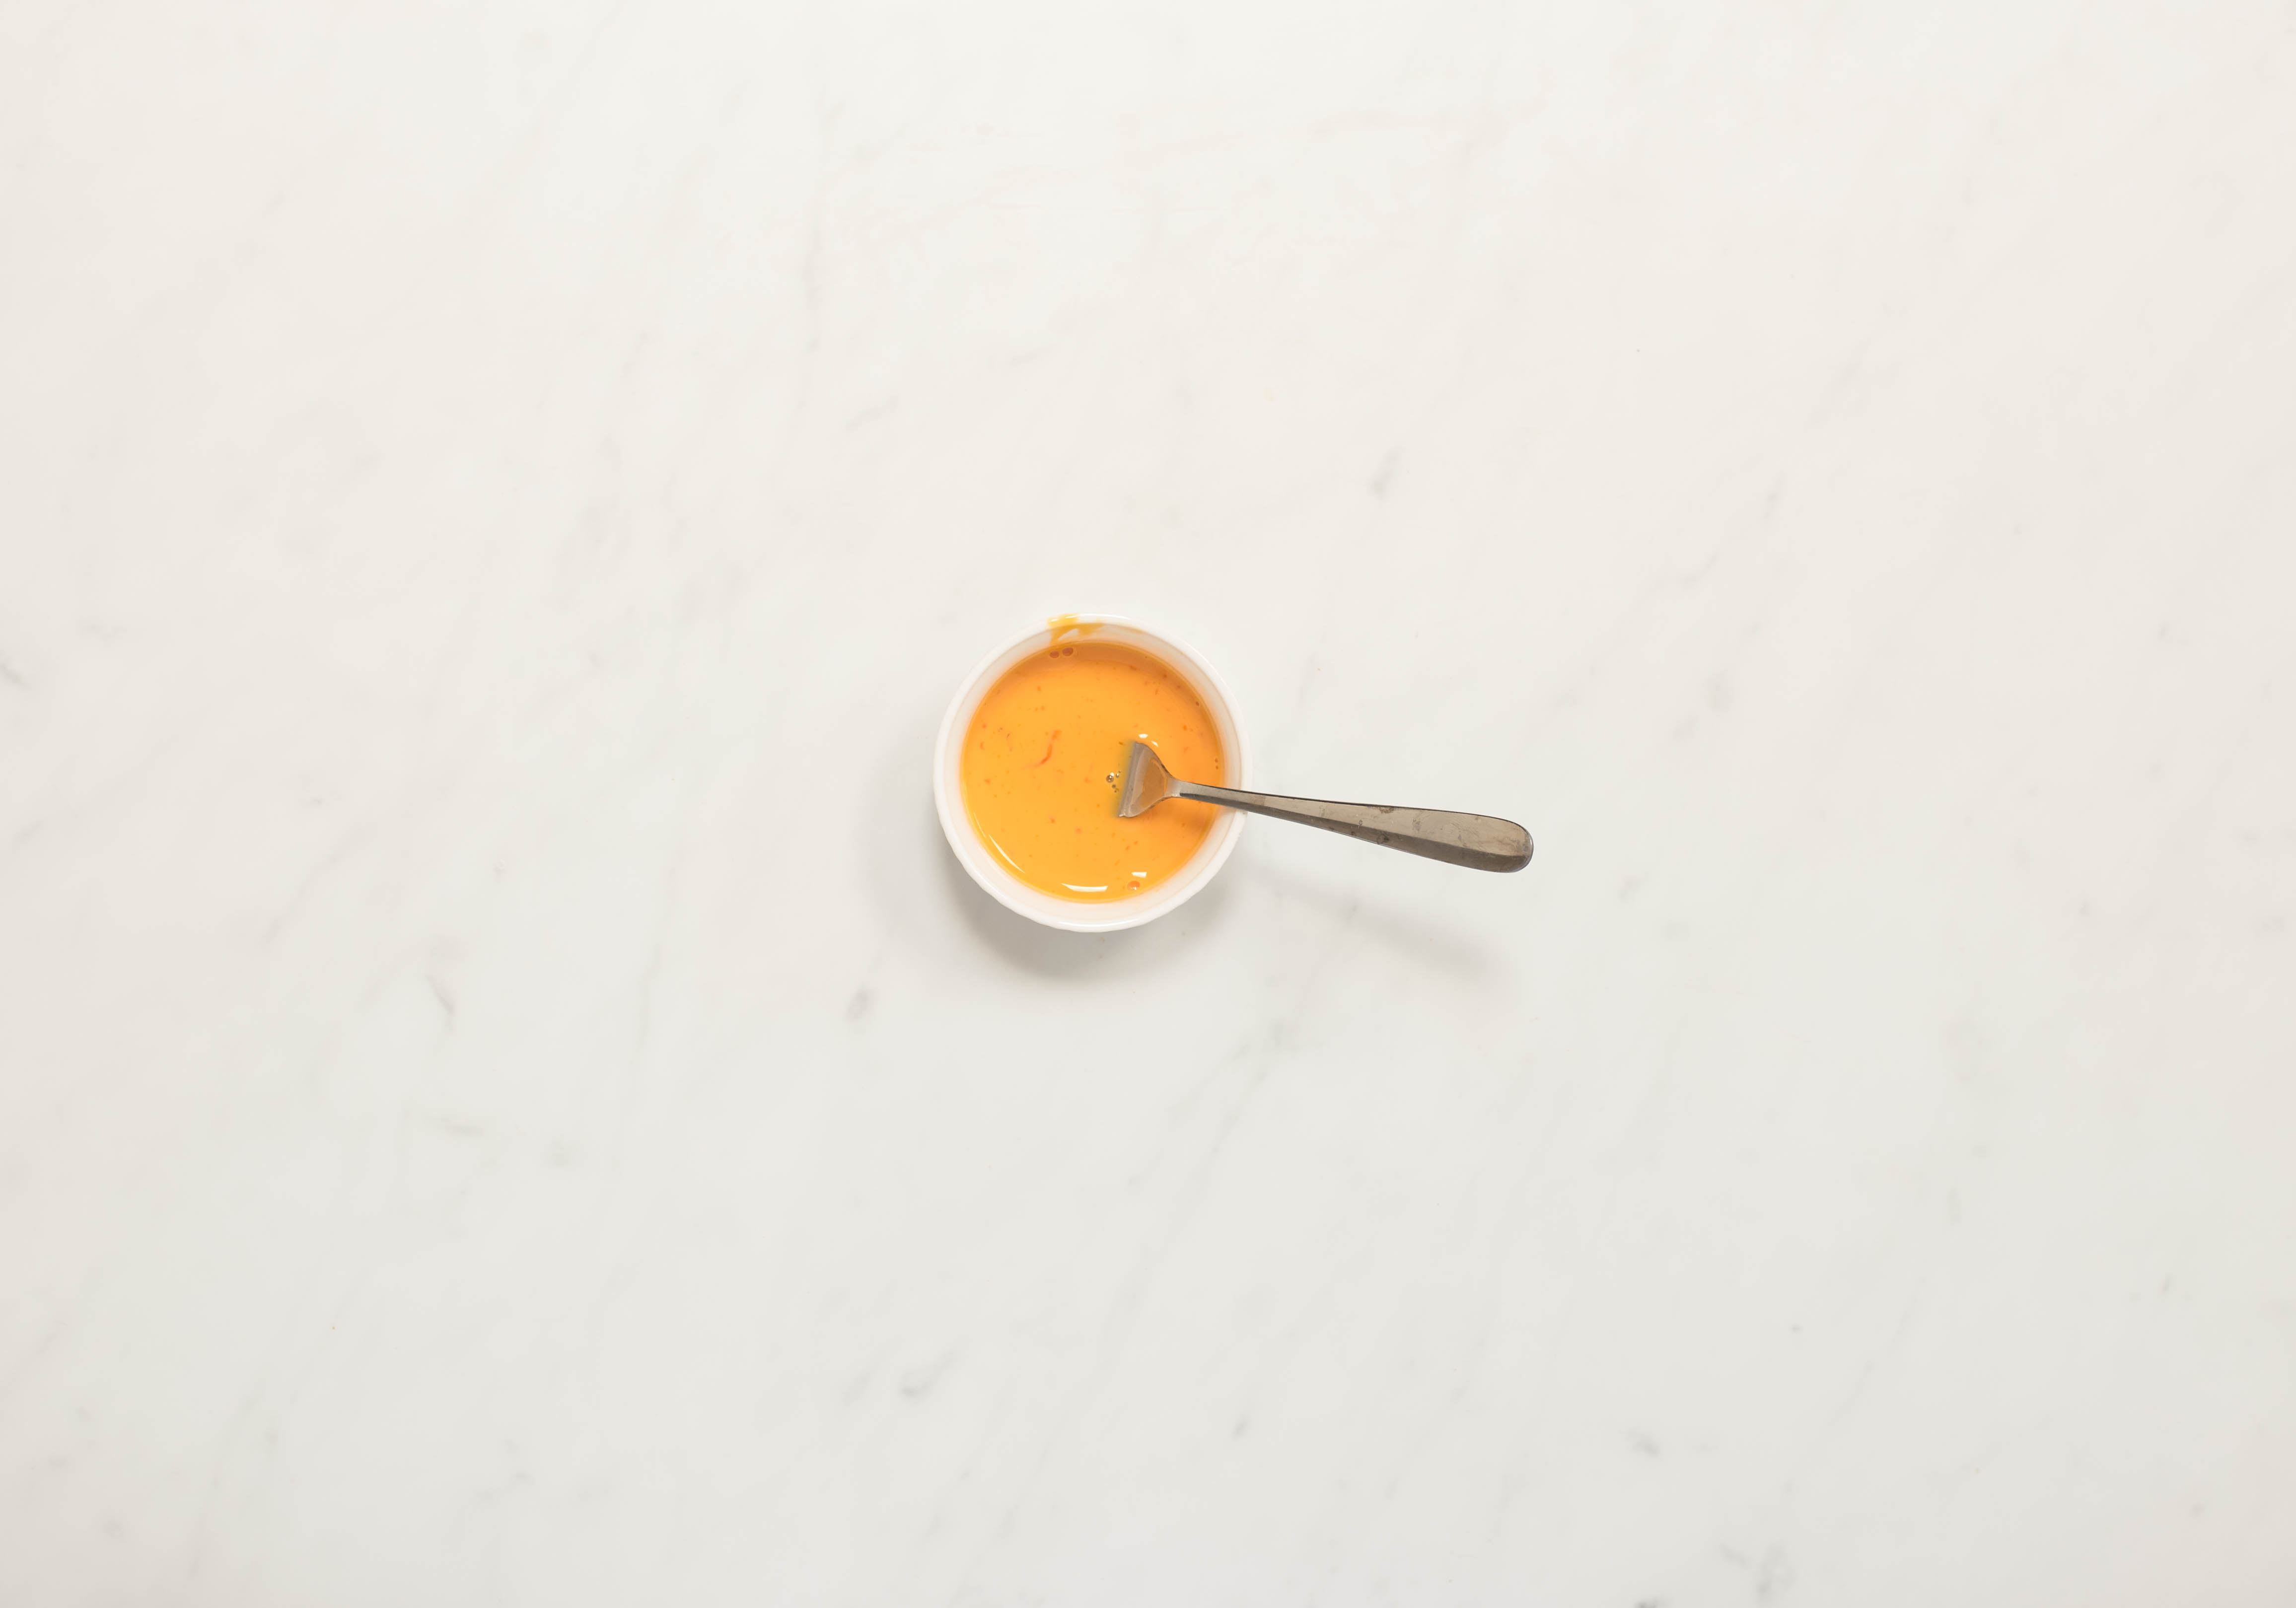 Combine egg yolk and cream